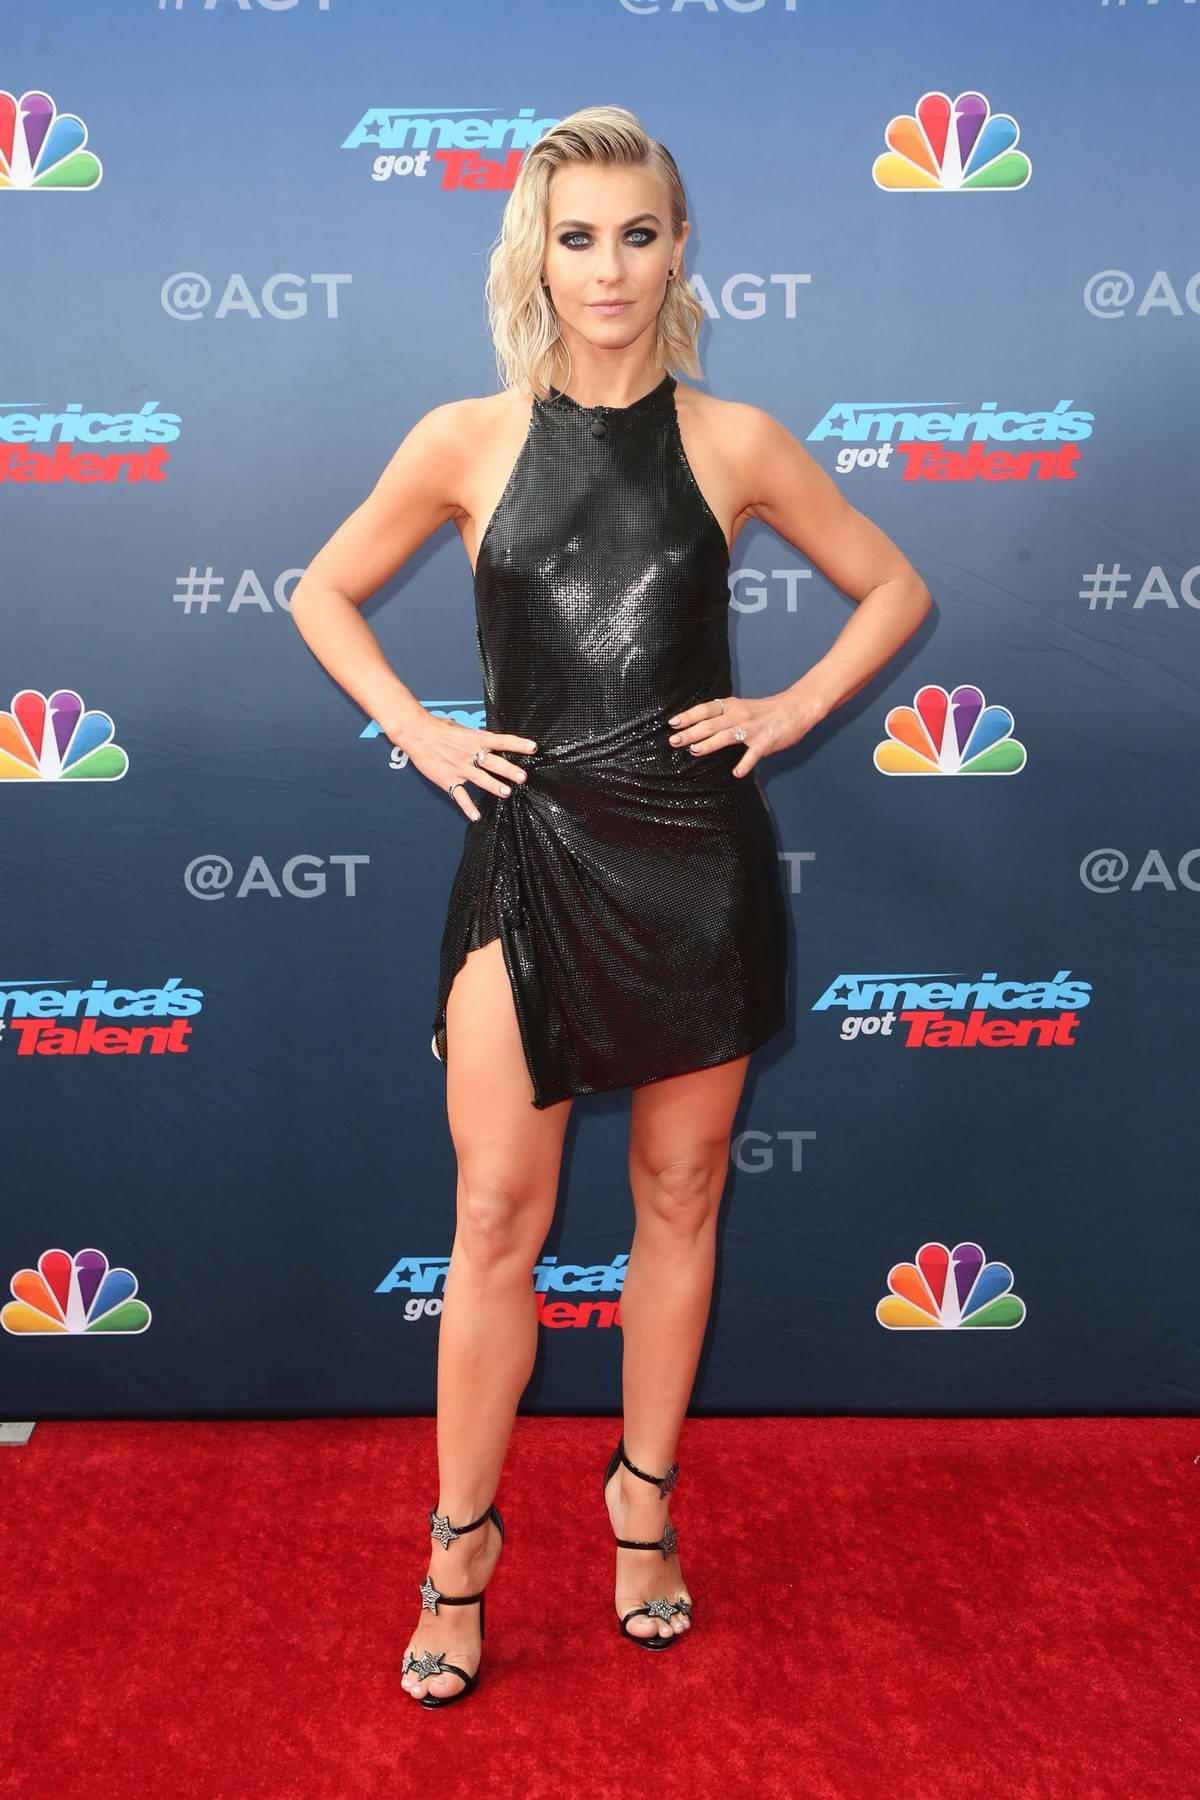 Julianne Hough attends NBC's 'America's Got Talent' Season 14 Kick-Off in Pasadena, California